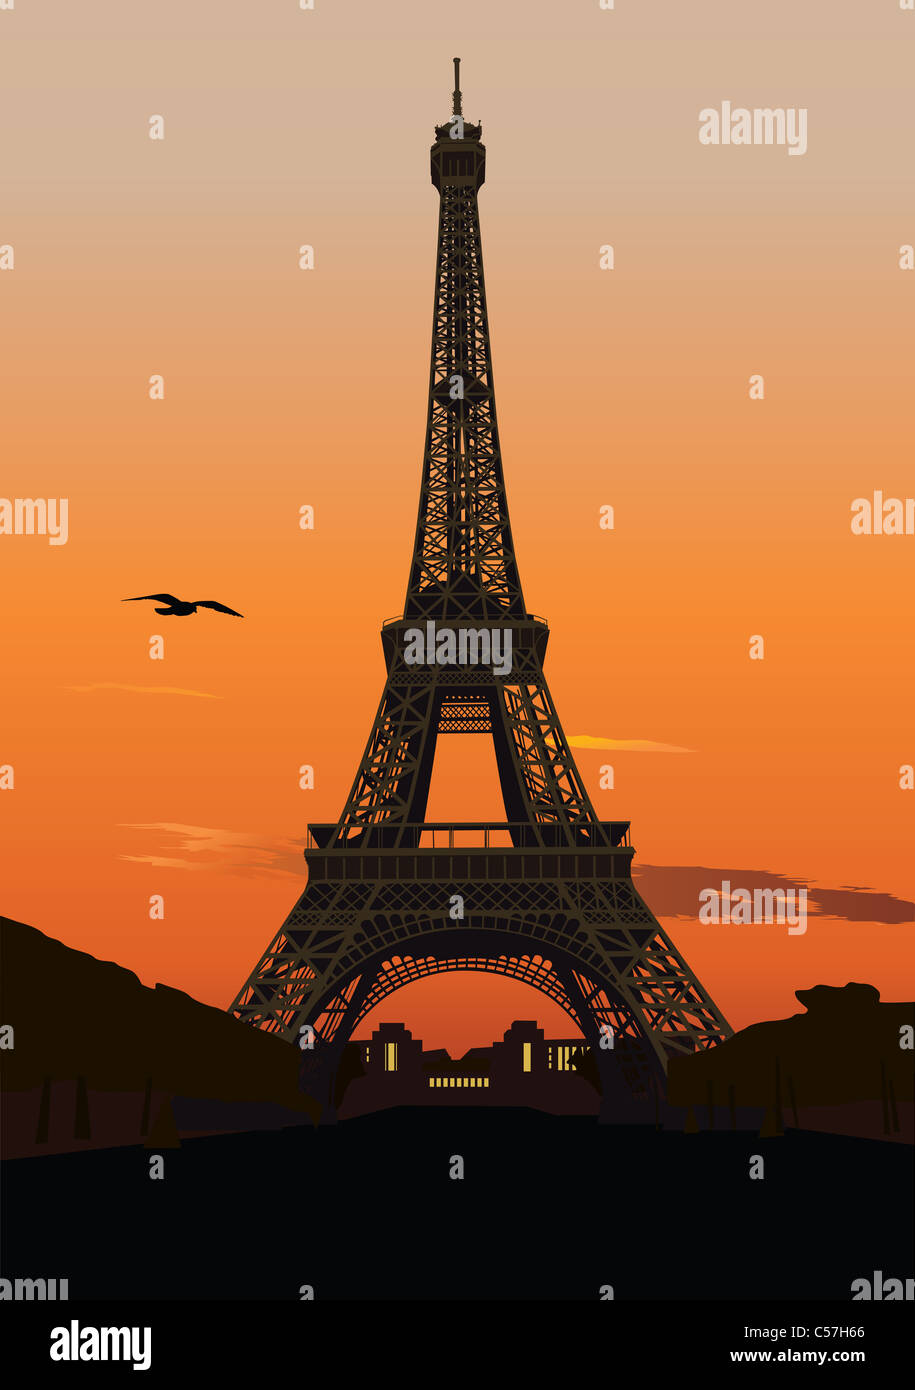 Vektor-Illustration der Eiffelturm bei Sonnenuntergang. Paris, Frankreich Stockbild